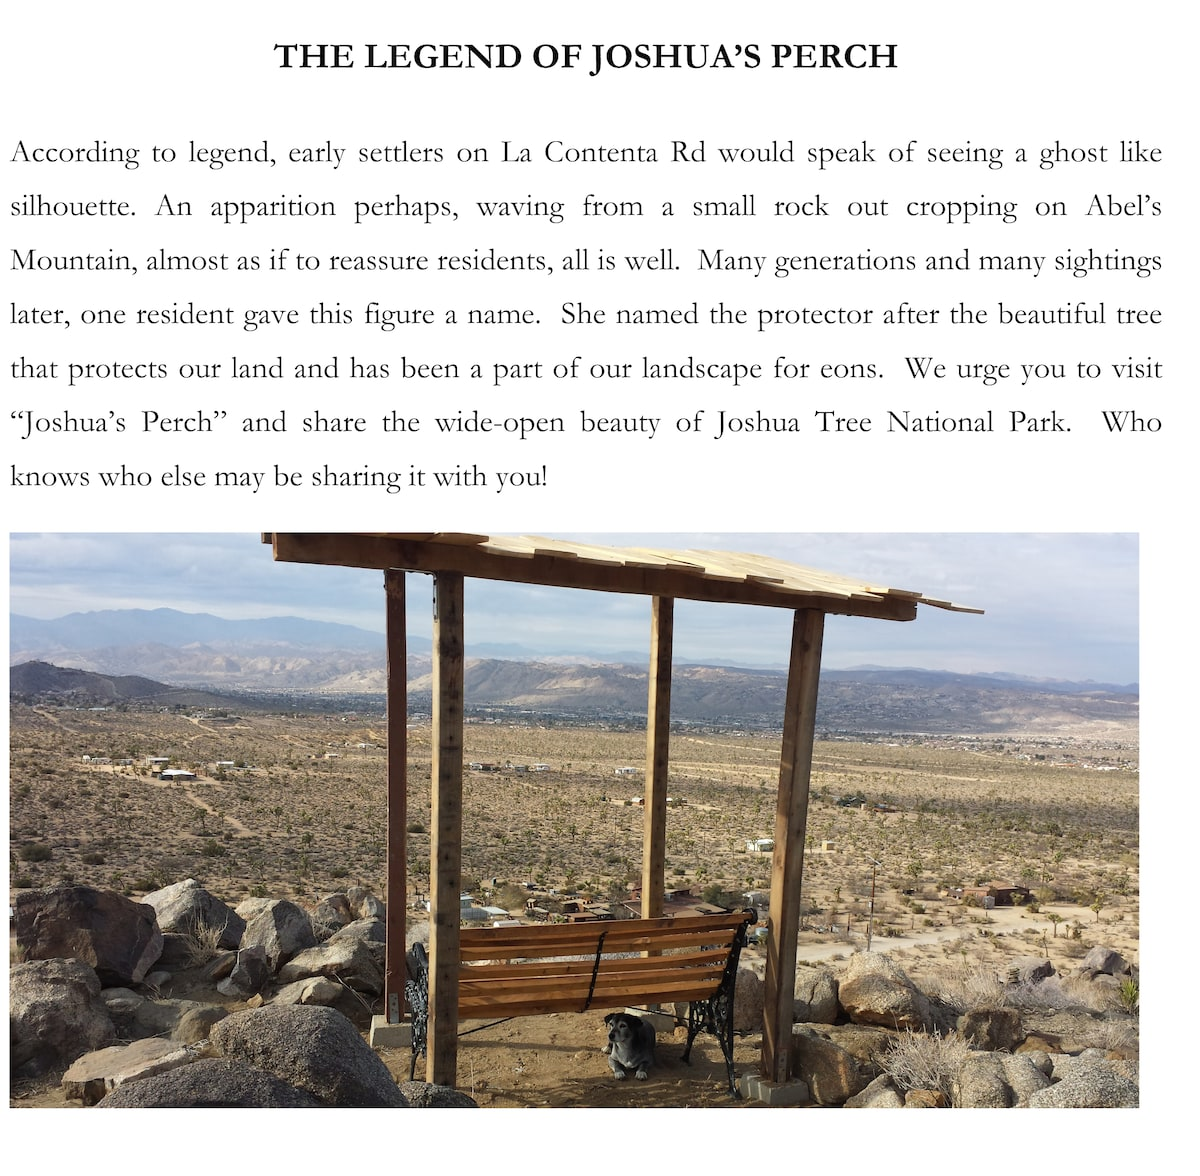 The legend of Joshua's Perch